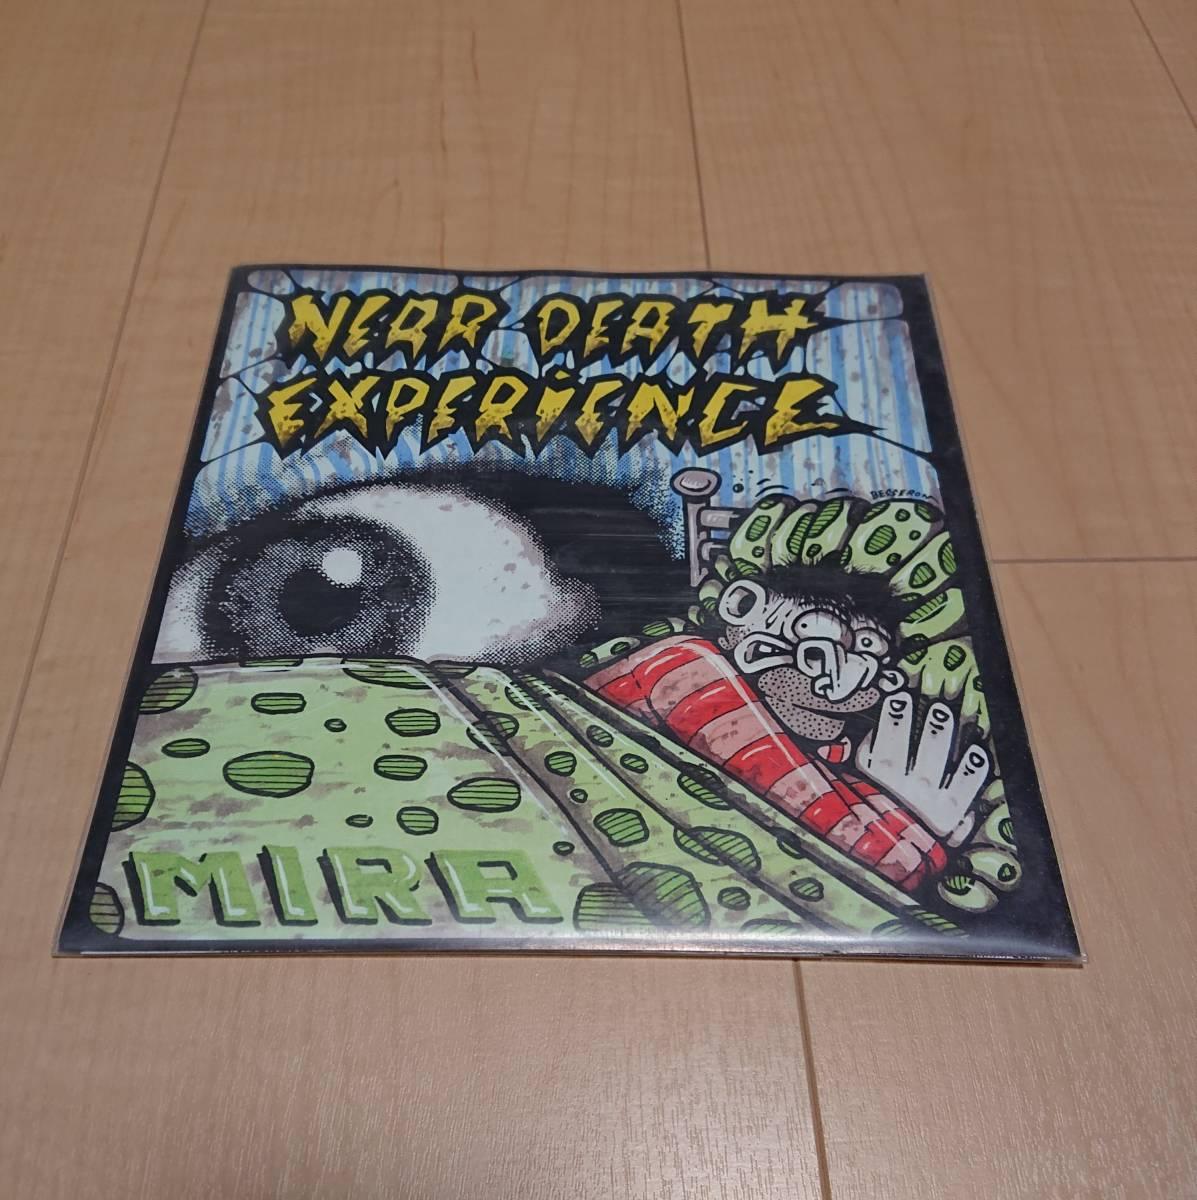 【Shaggy Hound - Near Death Experience / Split】nofx lag wagon pop punk